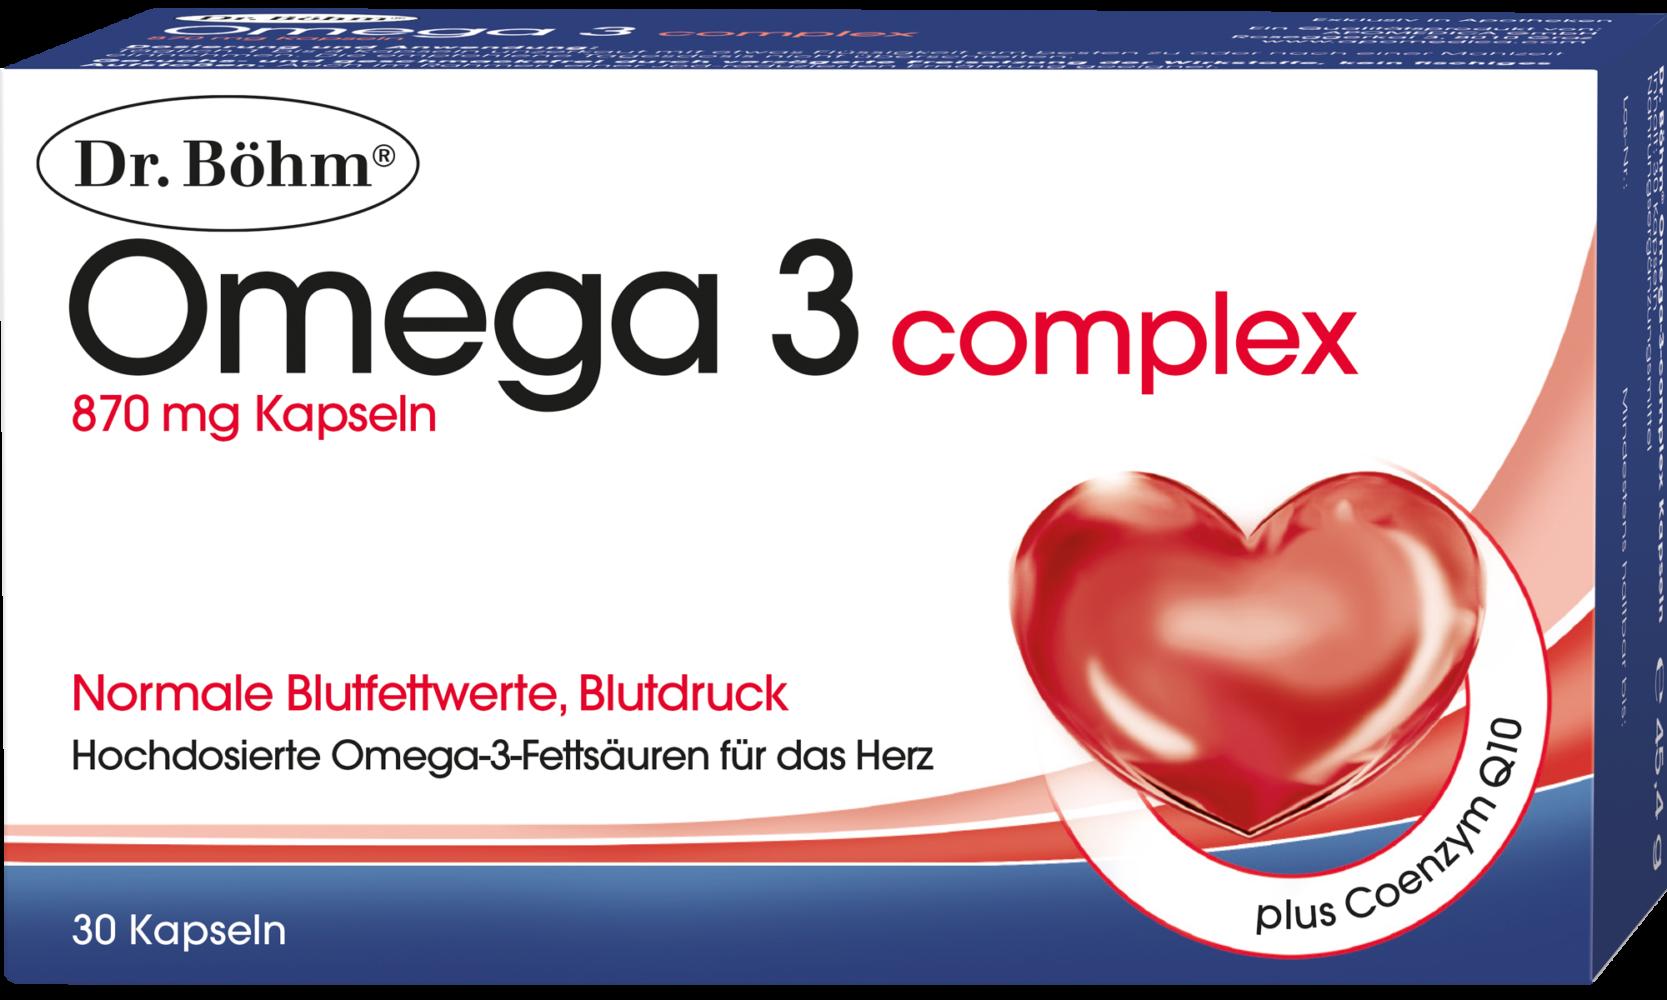 Dr. Böhm® Omega 3 complex Kapseln, hochdosierte Omega-3-Fettsäuren plus Coenzym Q10